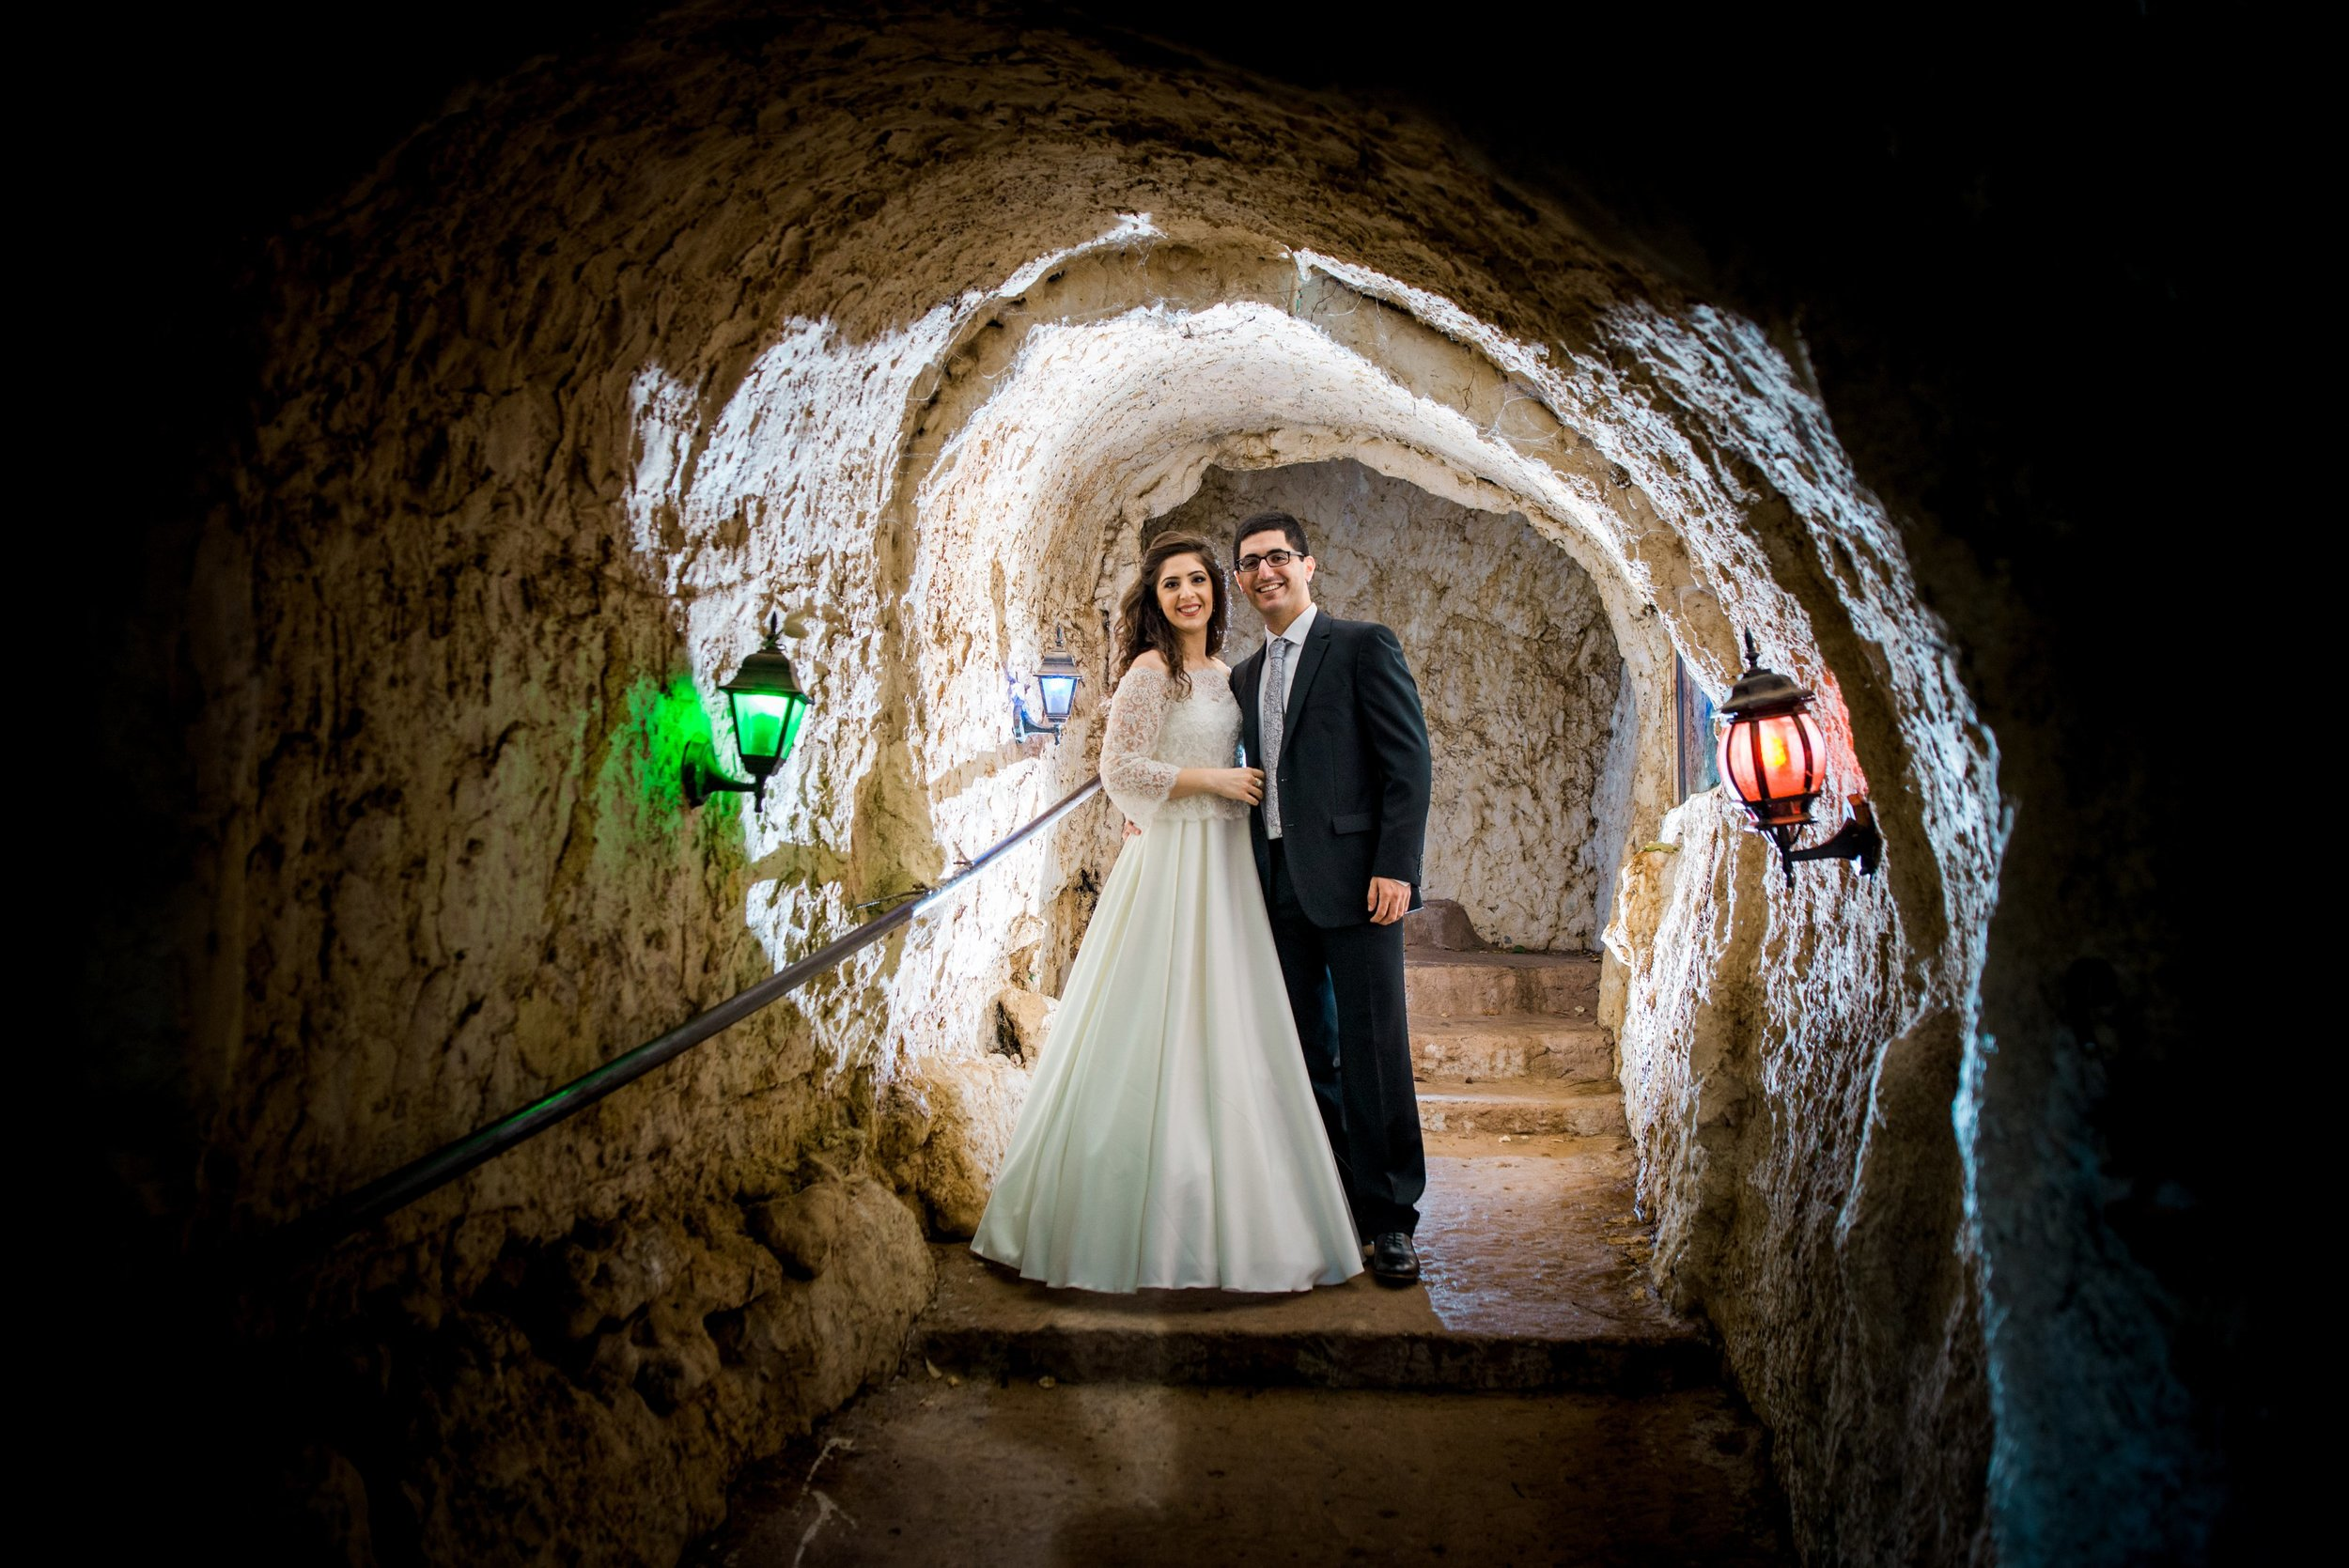 israel-garden-wedding-portraits-session-kate-giryes-photography--28_WEB.jpg